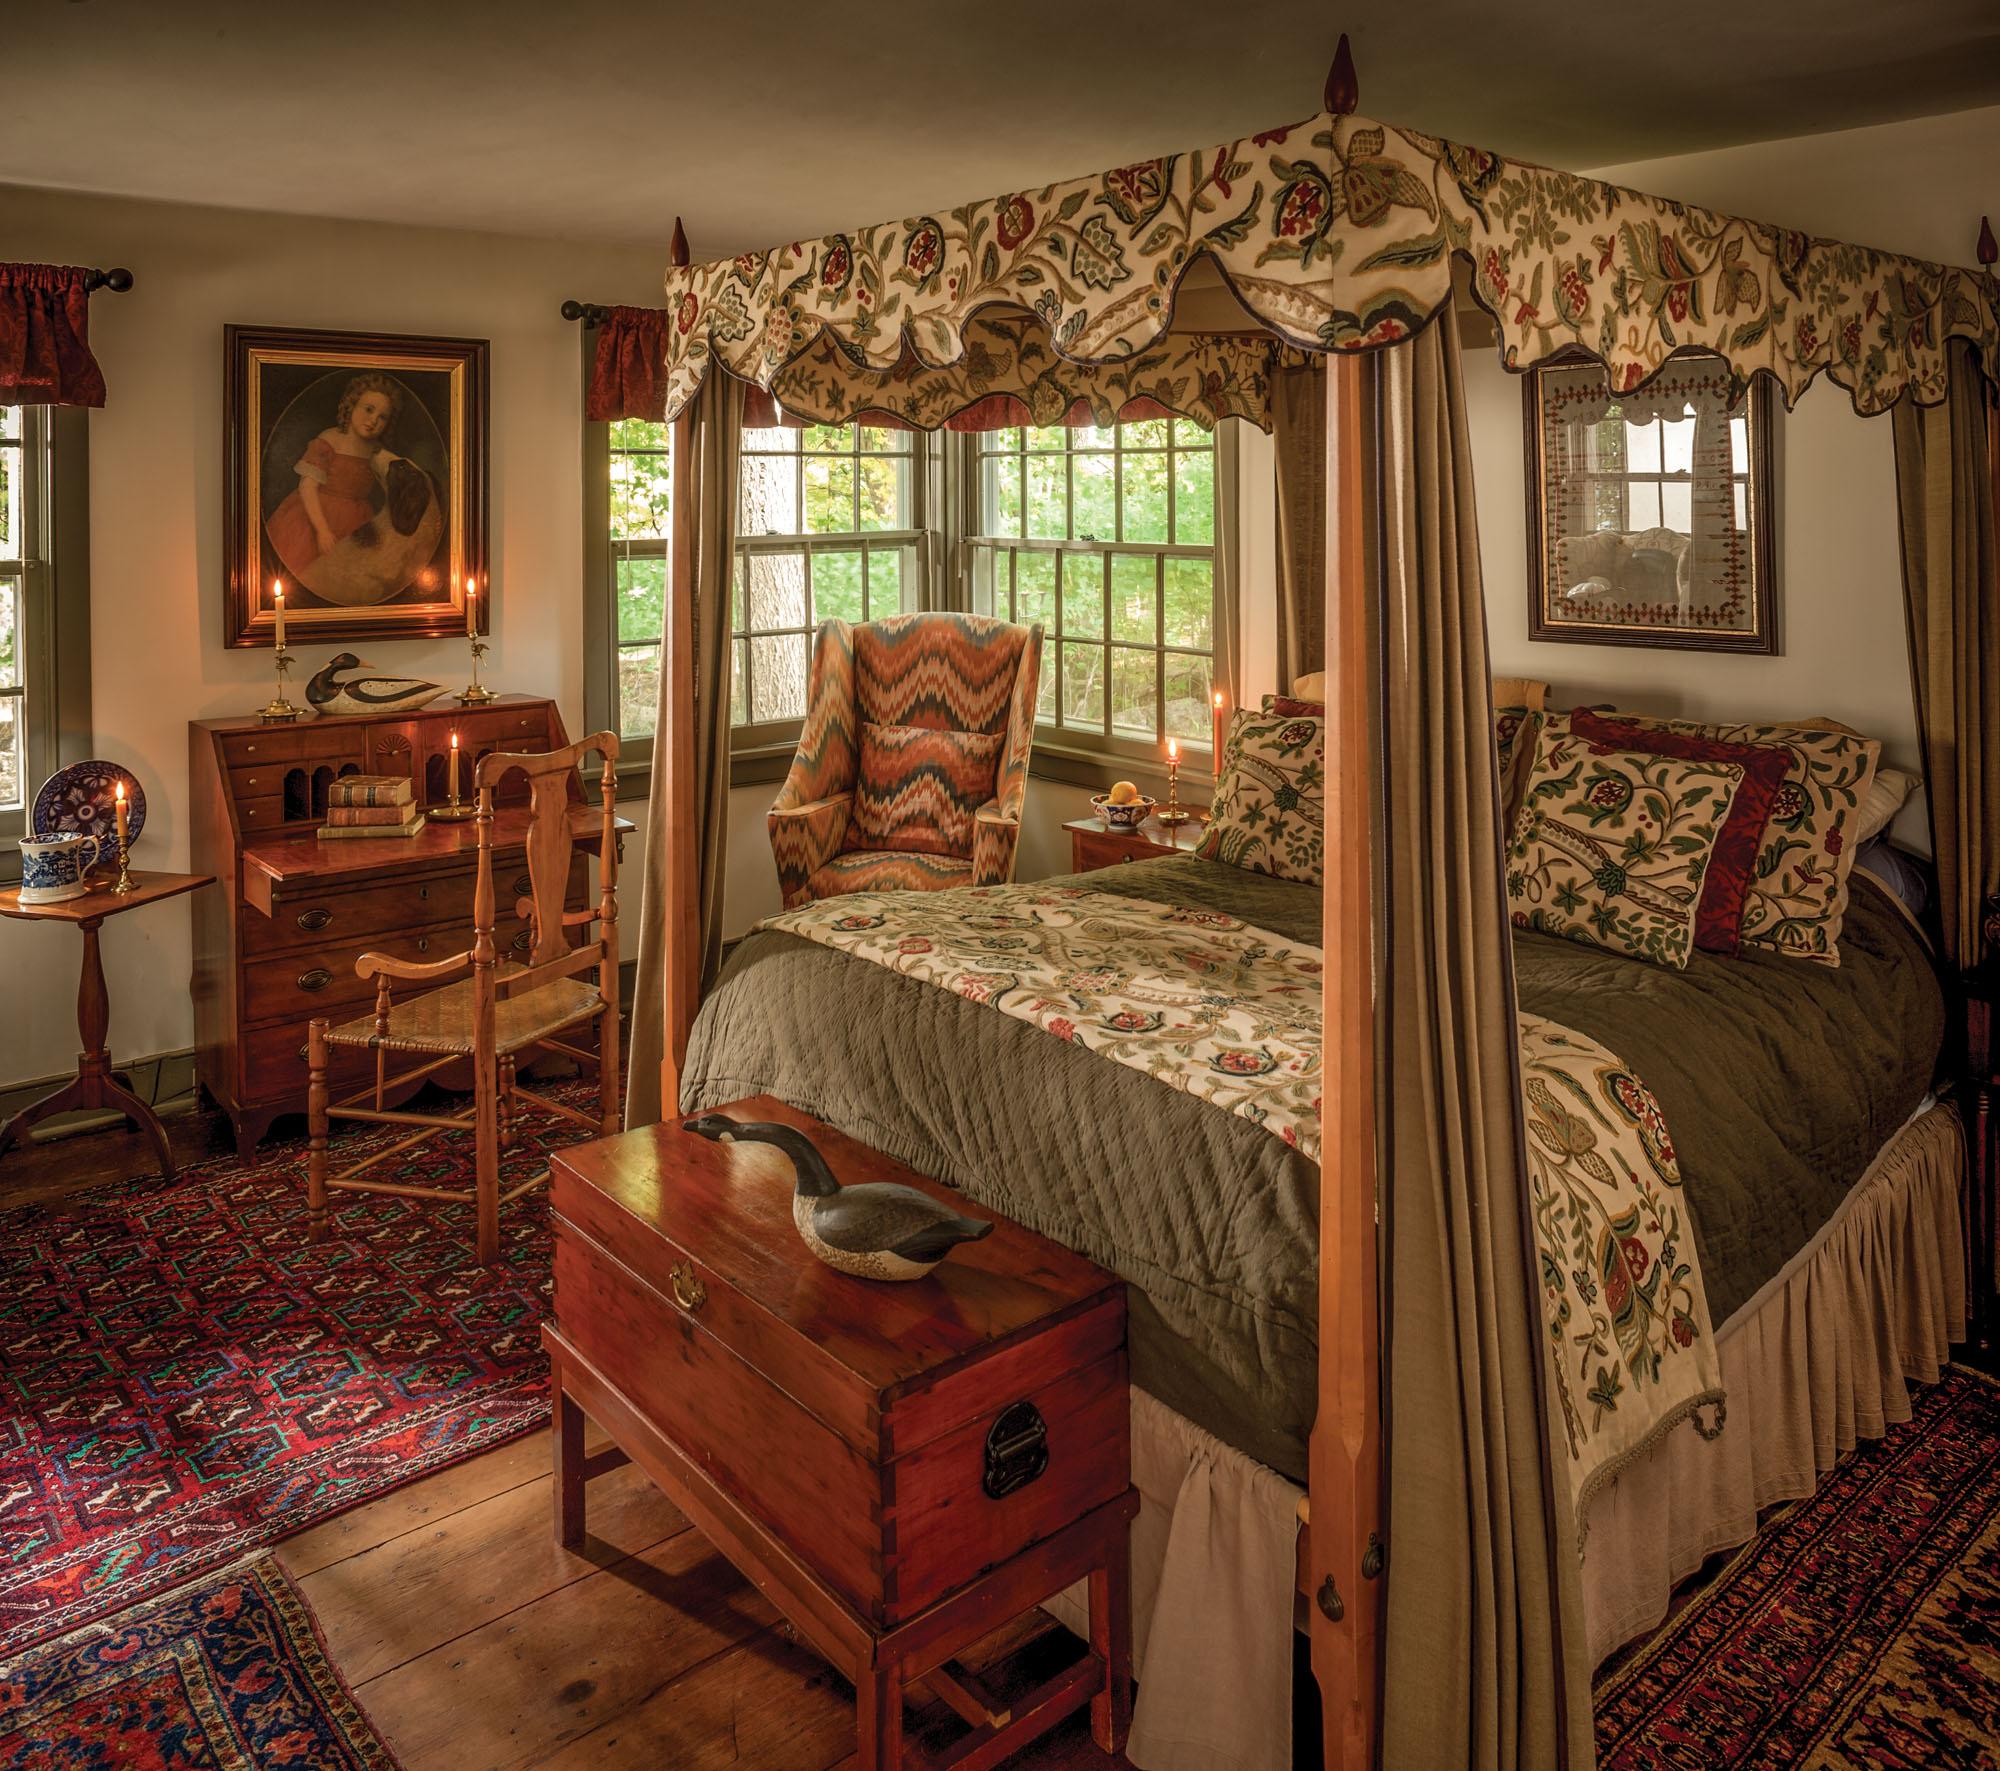 Colonial-era bedroom, canopy bed